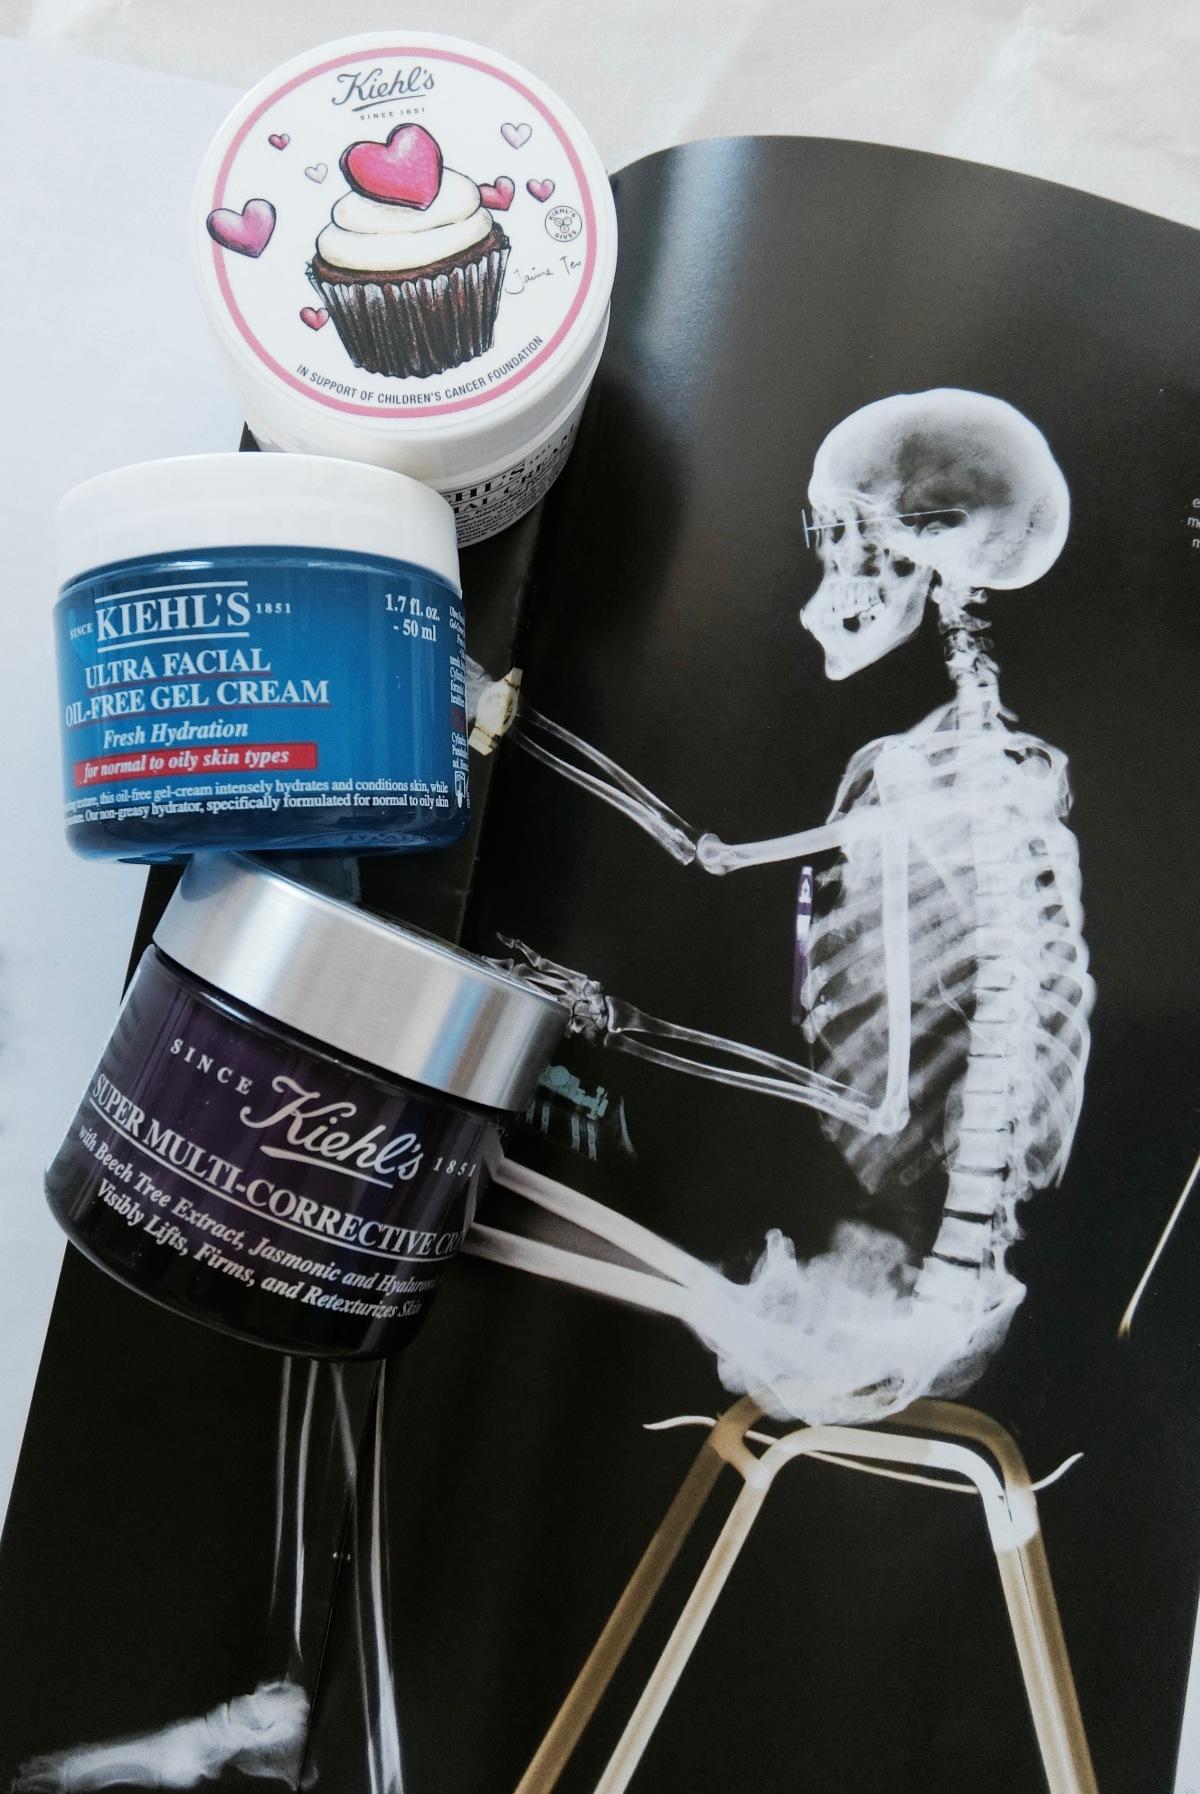 Mr Bones, and his fave beauty formulas